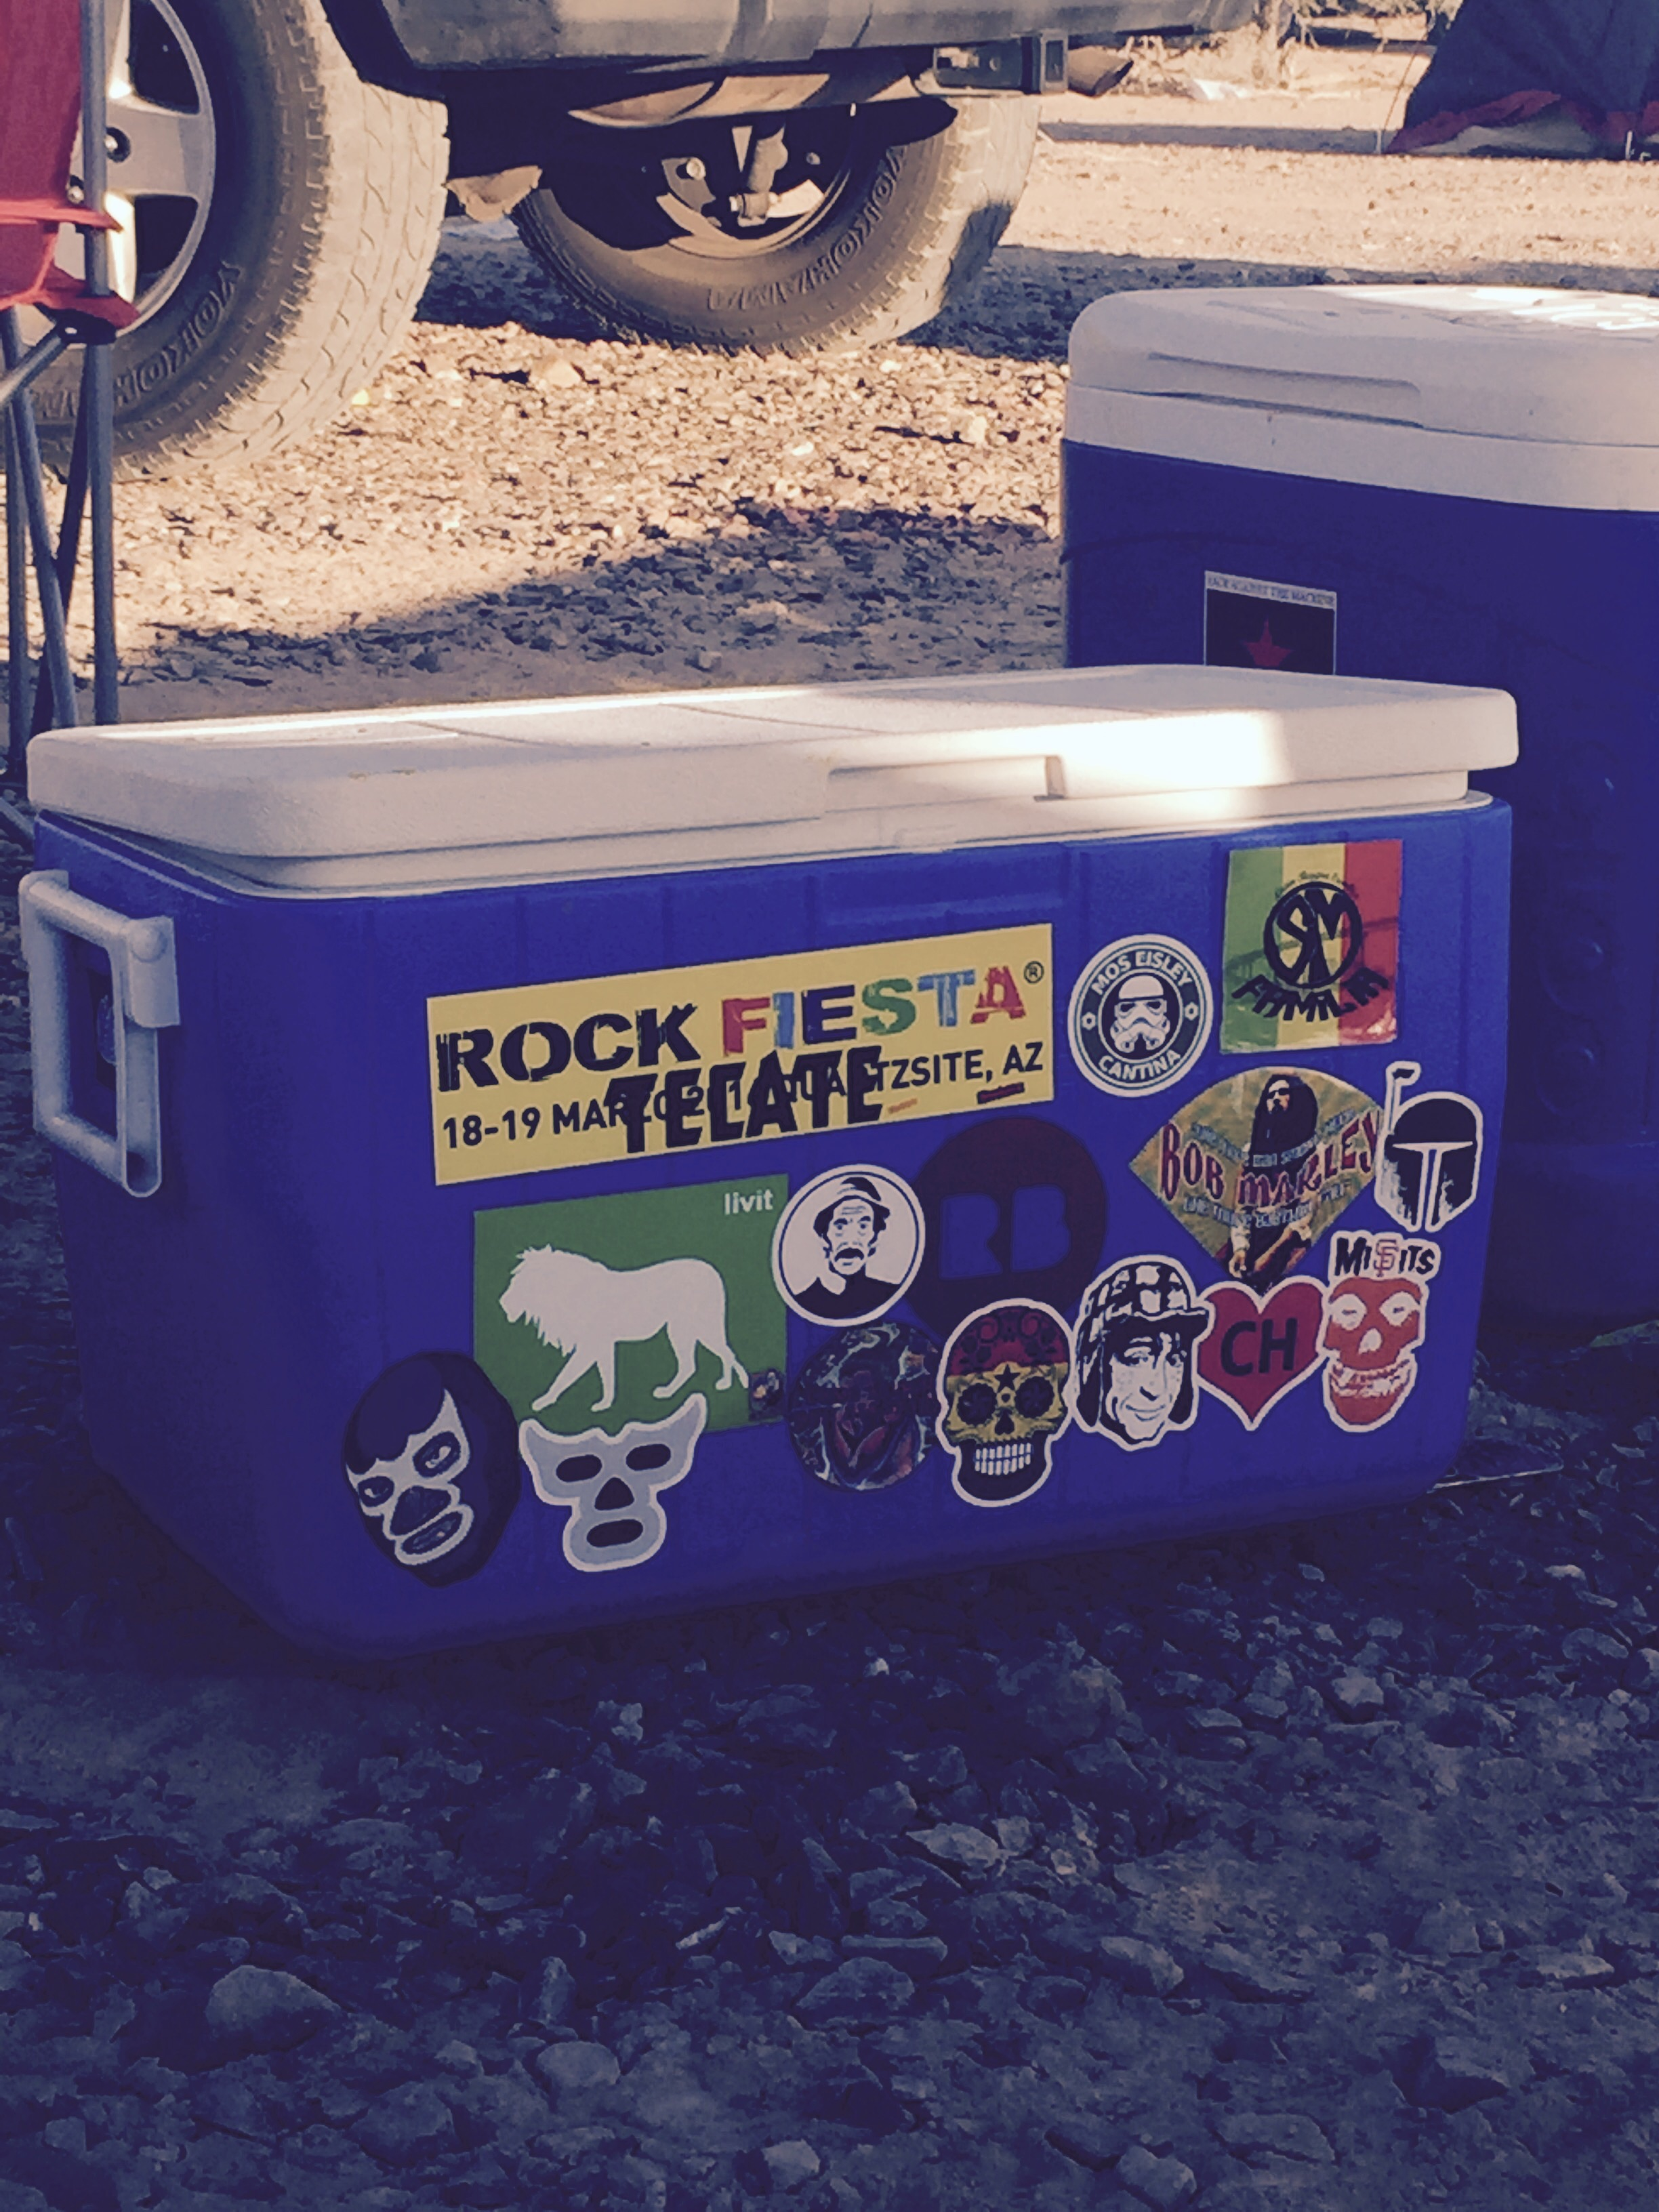 Camping refrigerator.